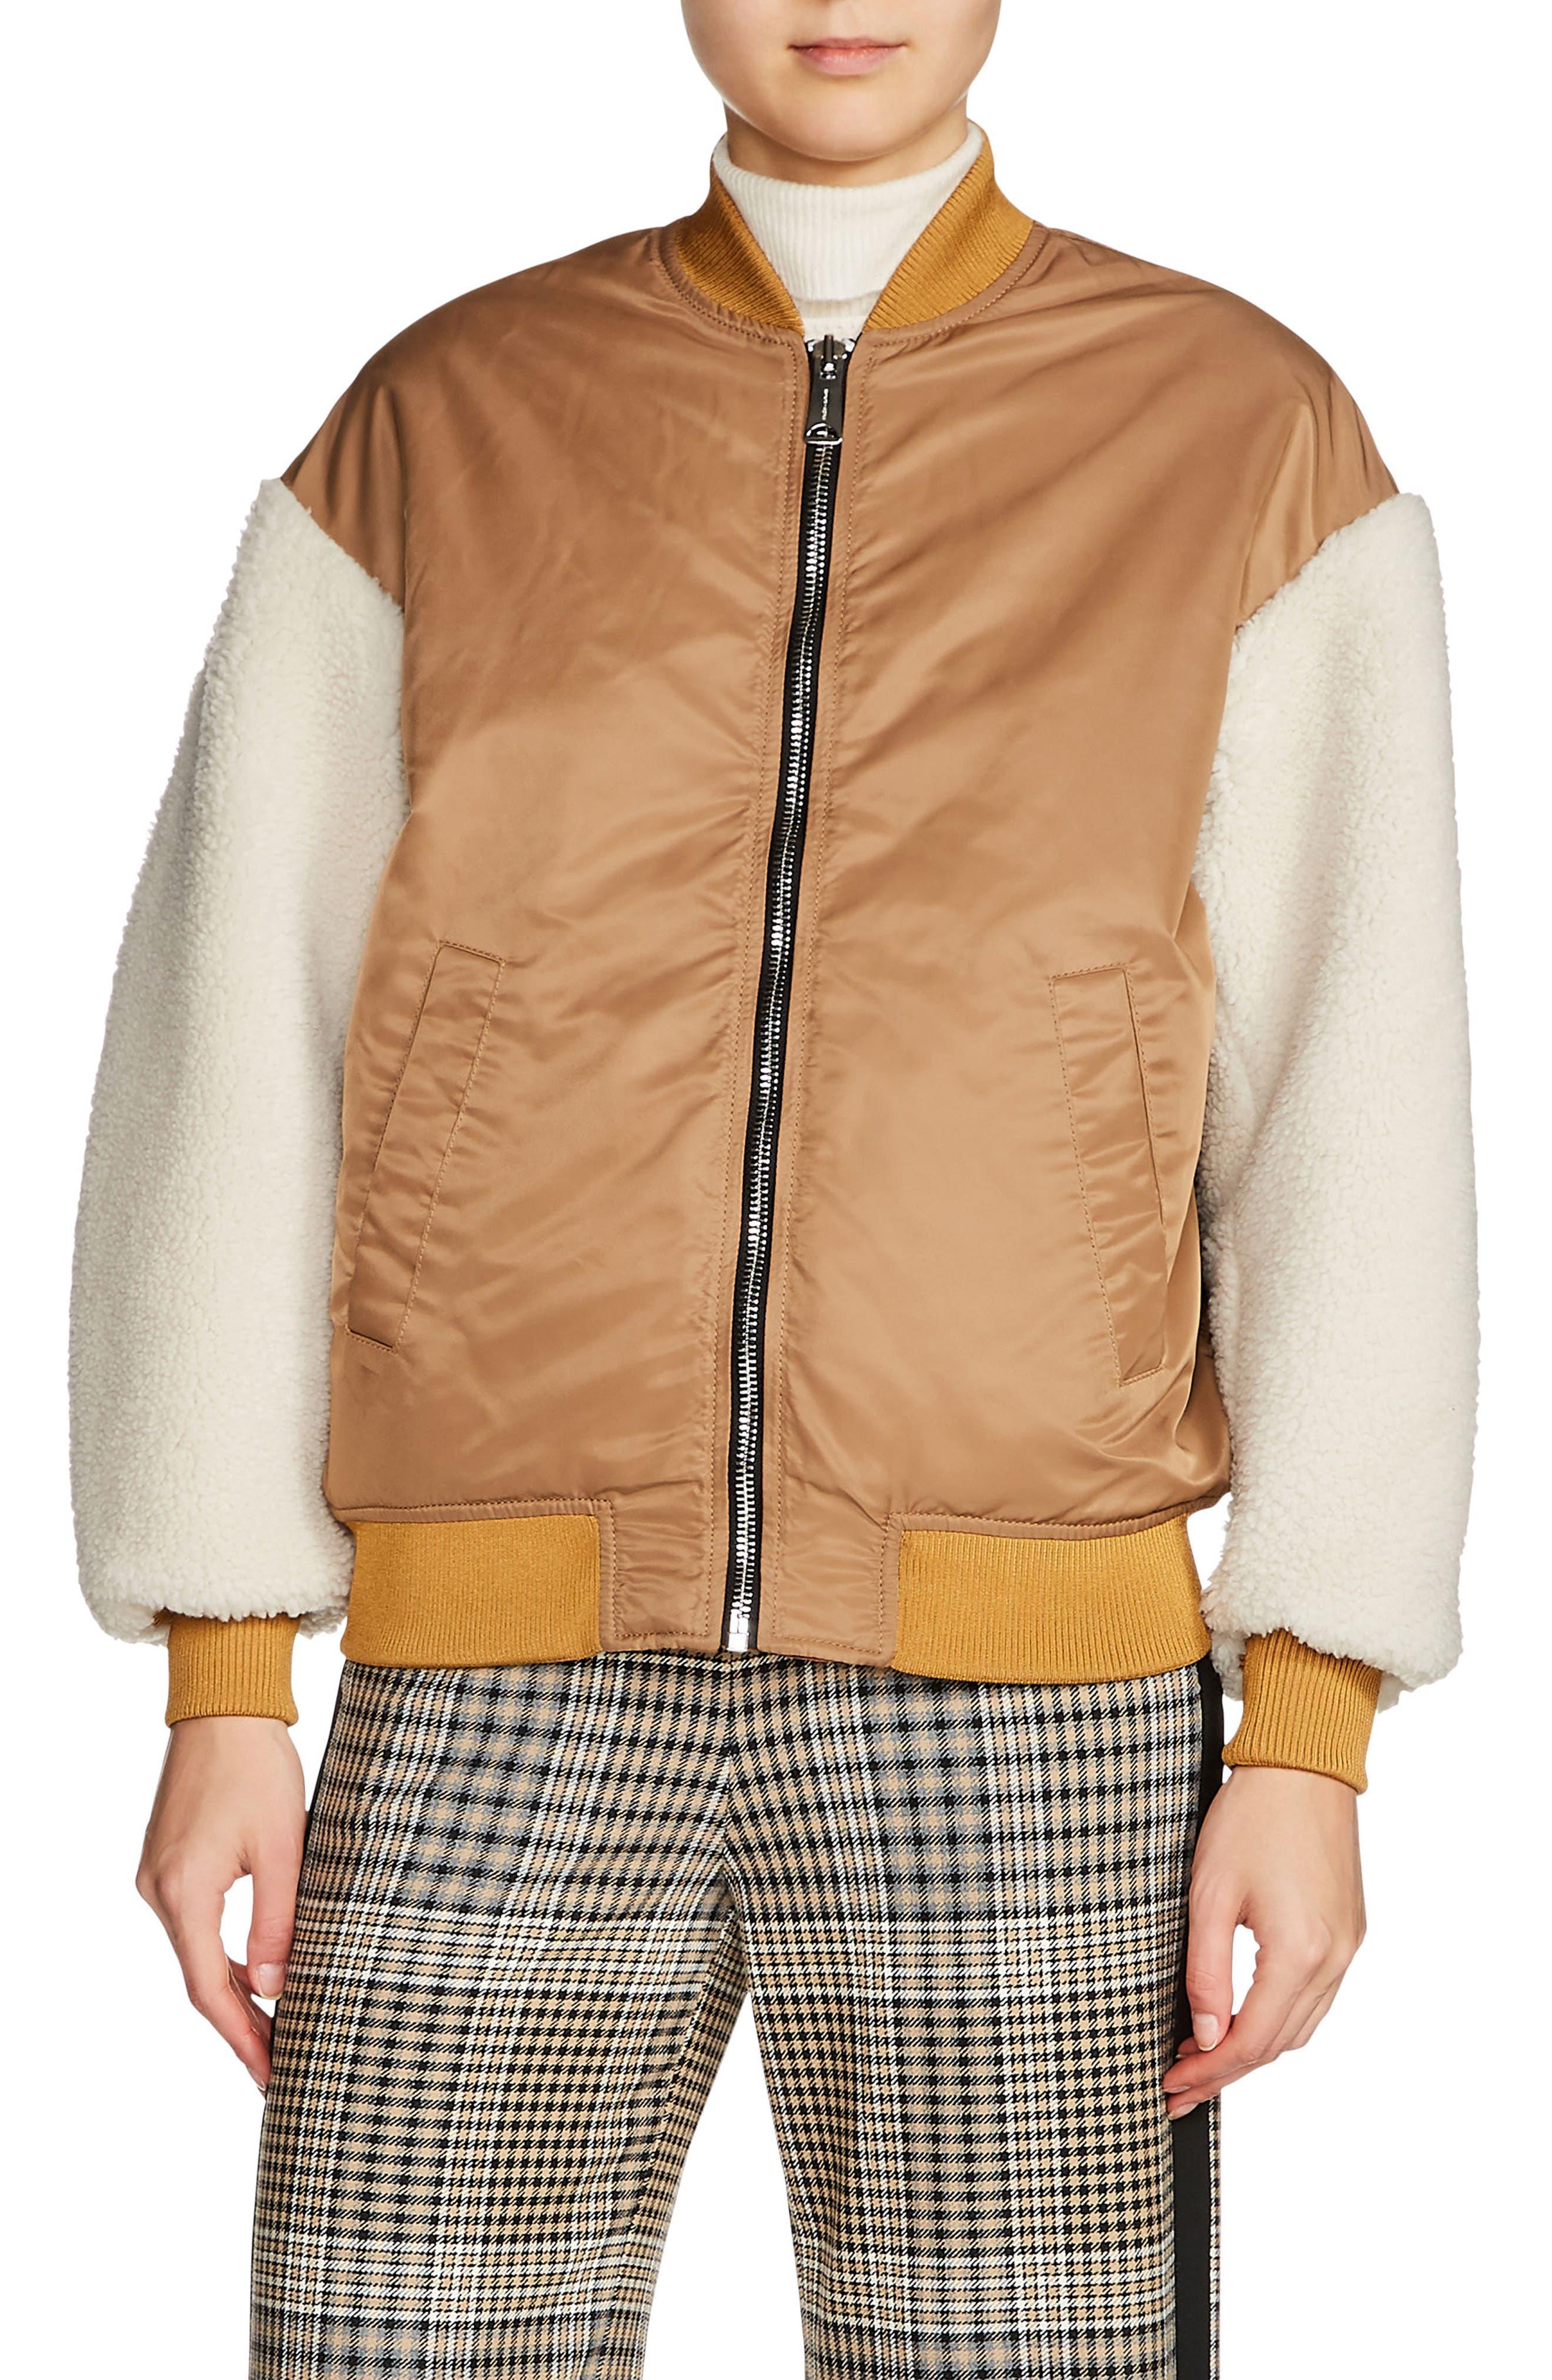 Schott Genuine Shearling Sleeve Bomber Jacket,                             Main thumbnail 1, color,                             201